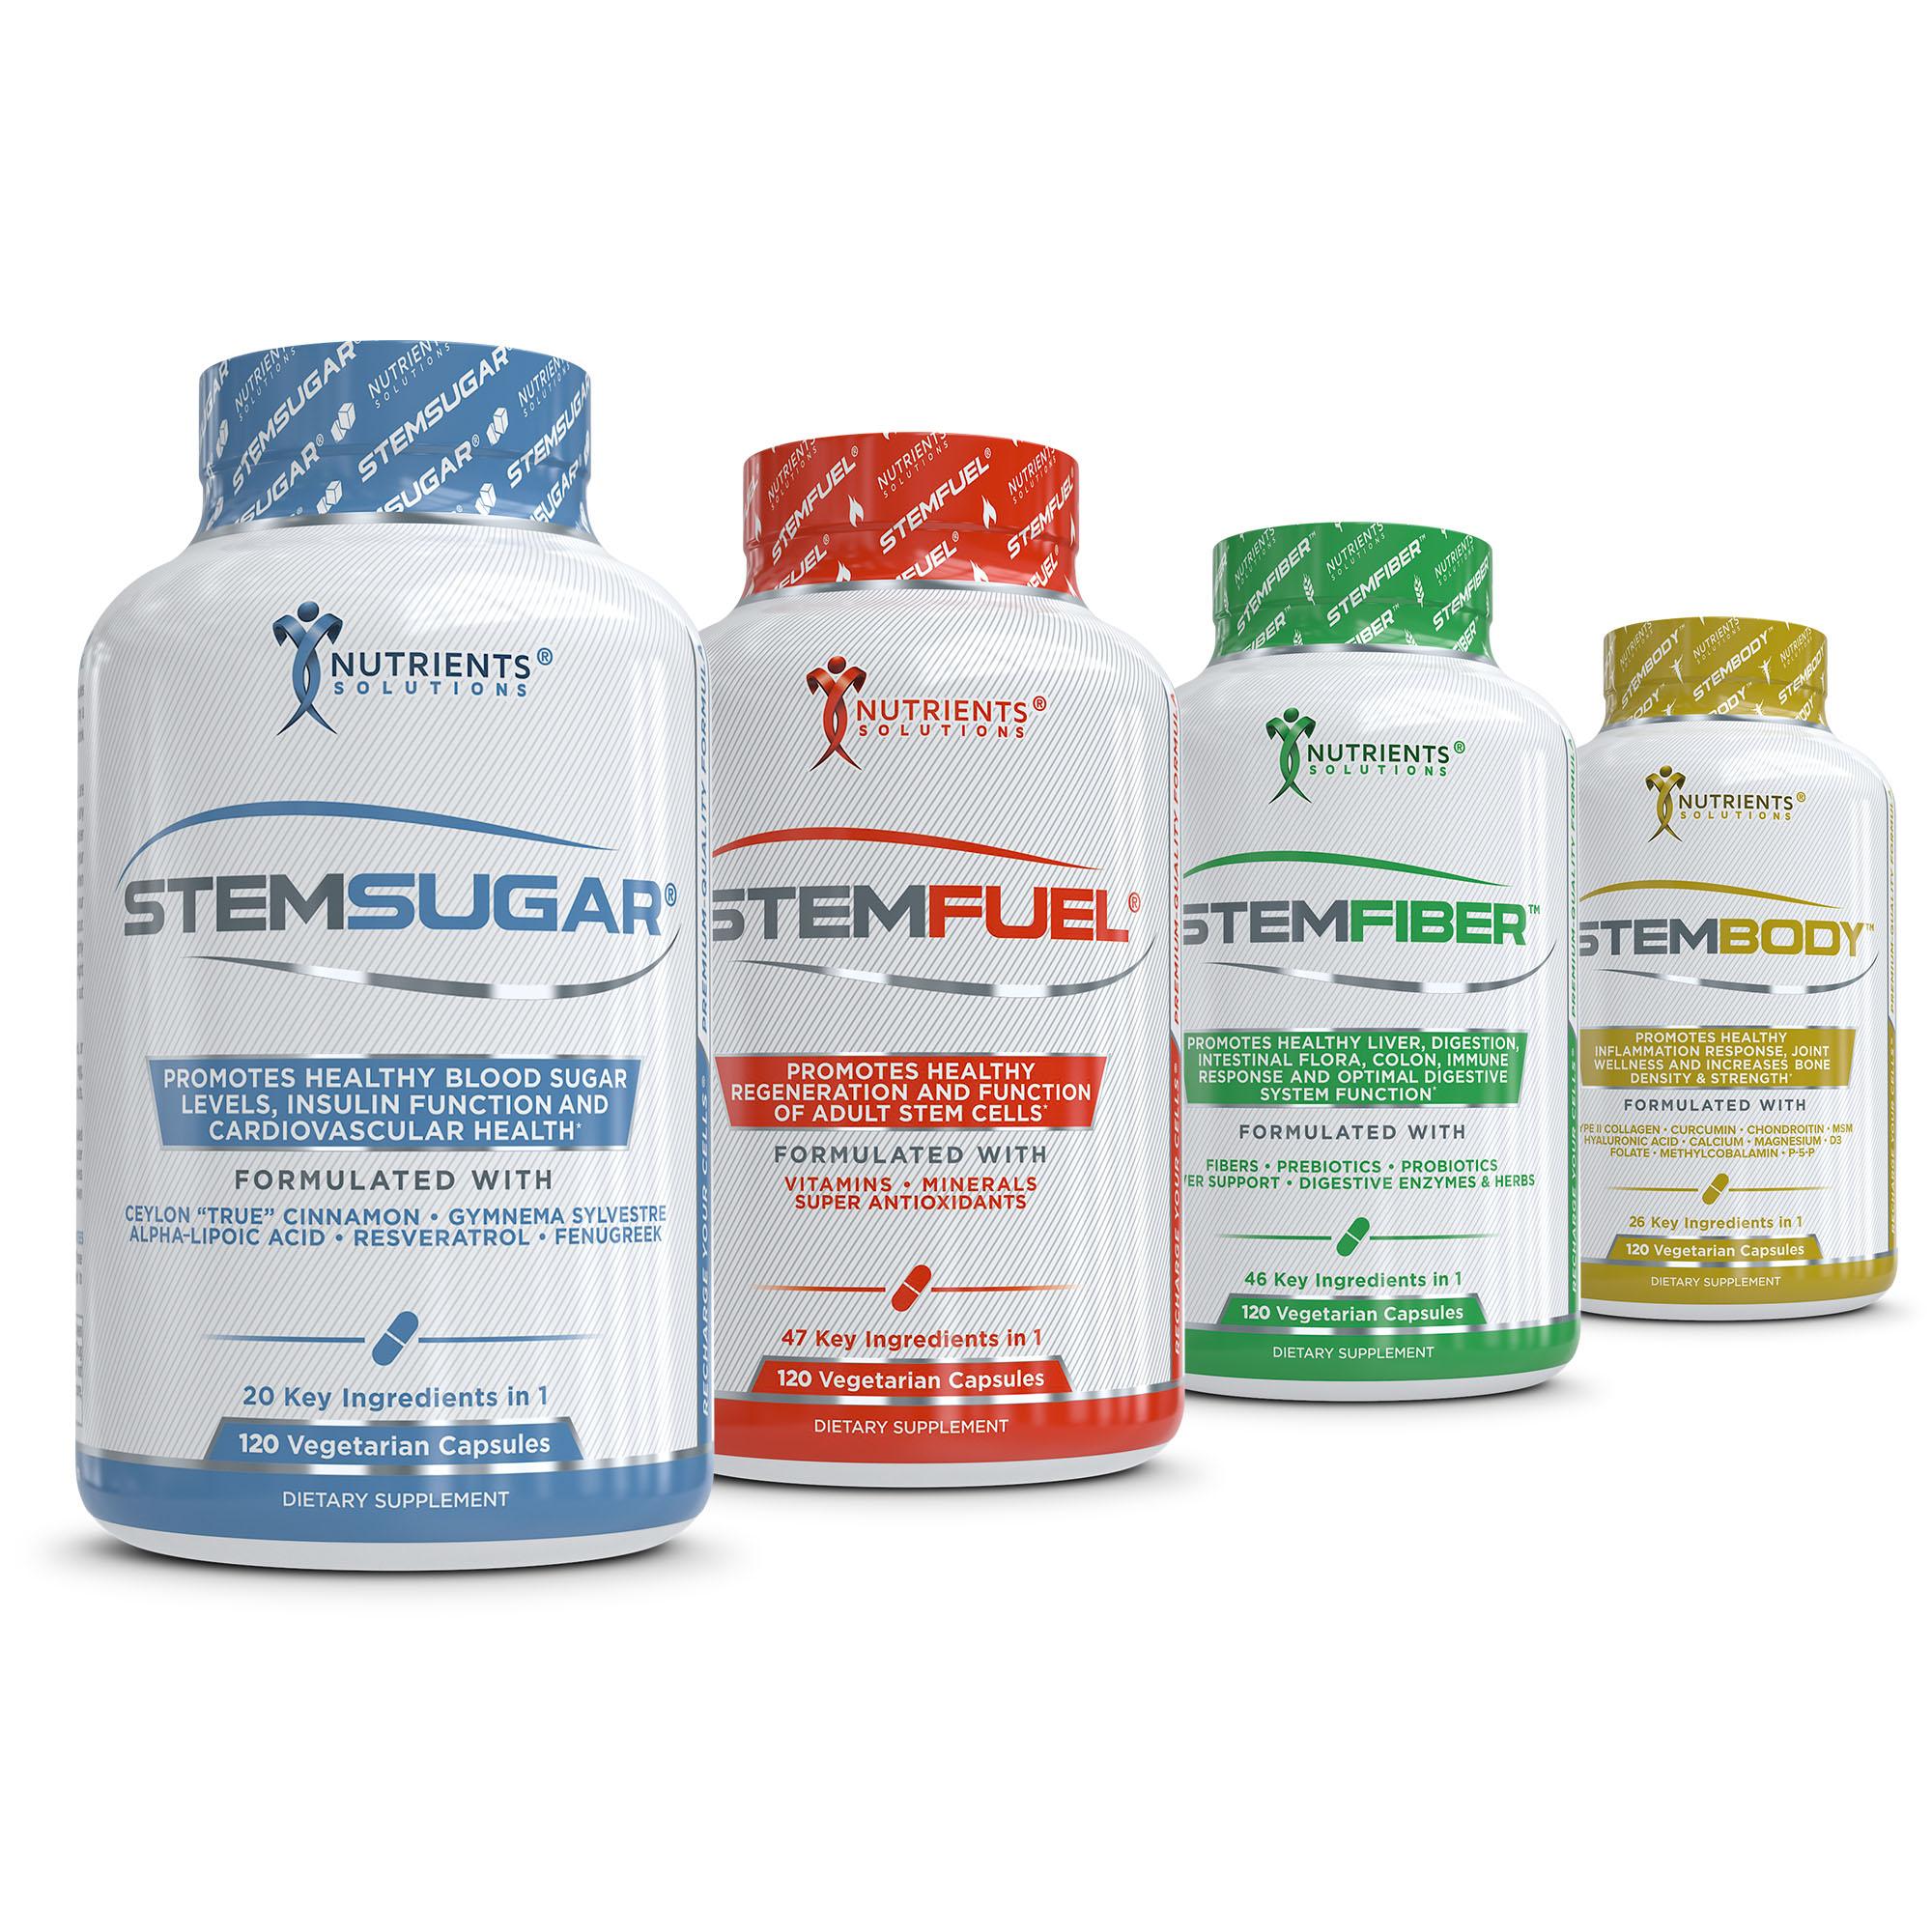 Nutrient shrink label bottles arranged on white background